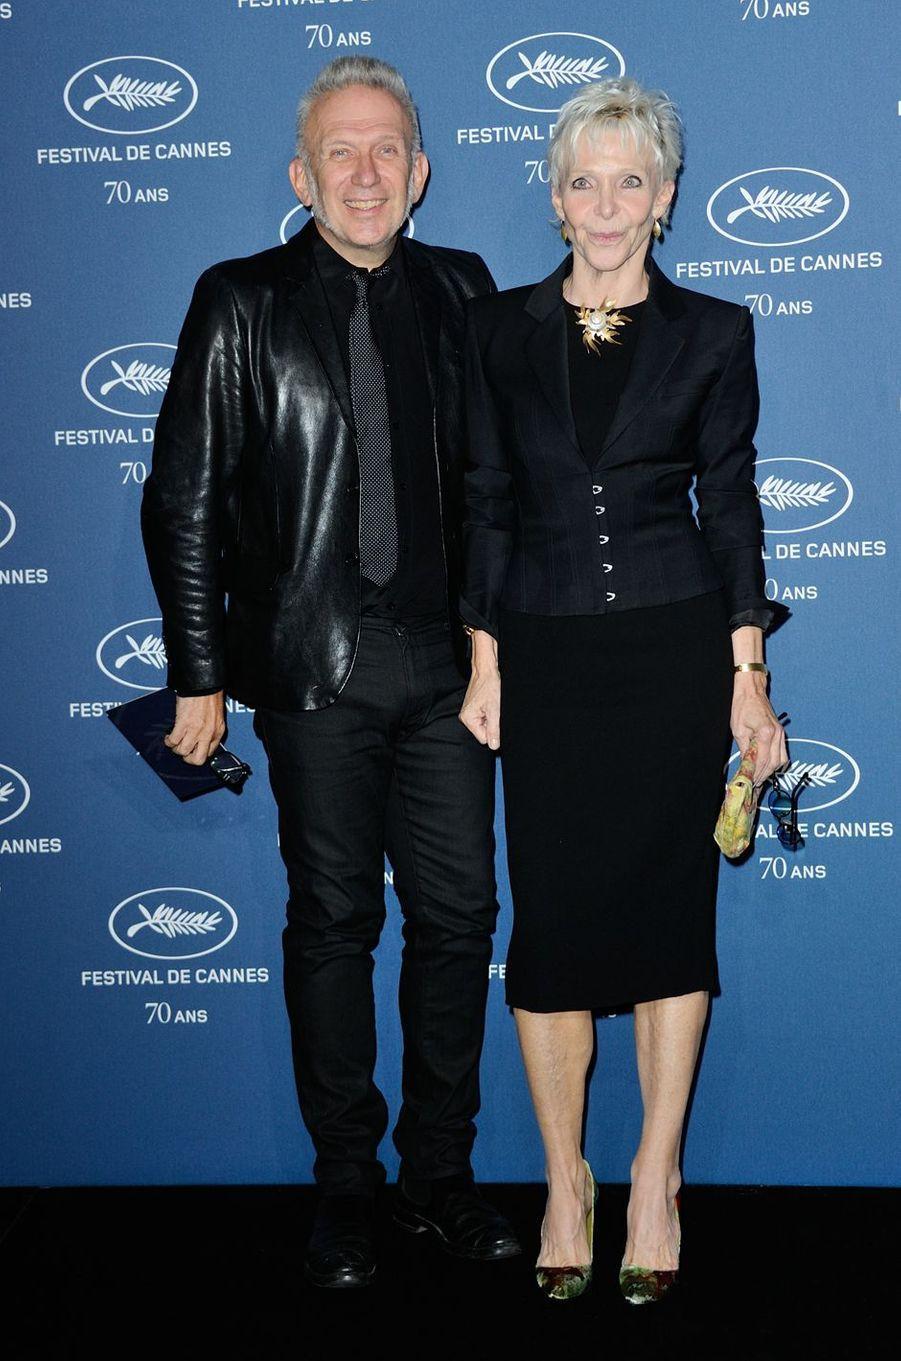 Jean-Paul Gaultier et Tonie Marshall.